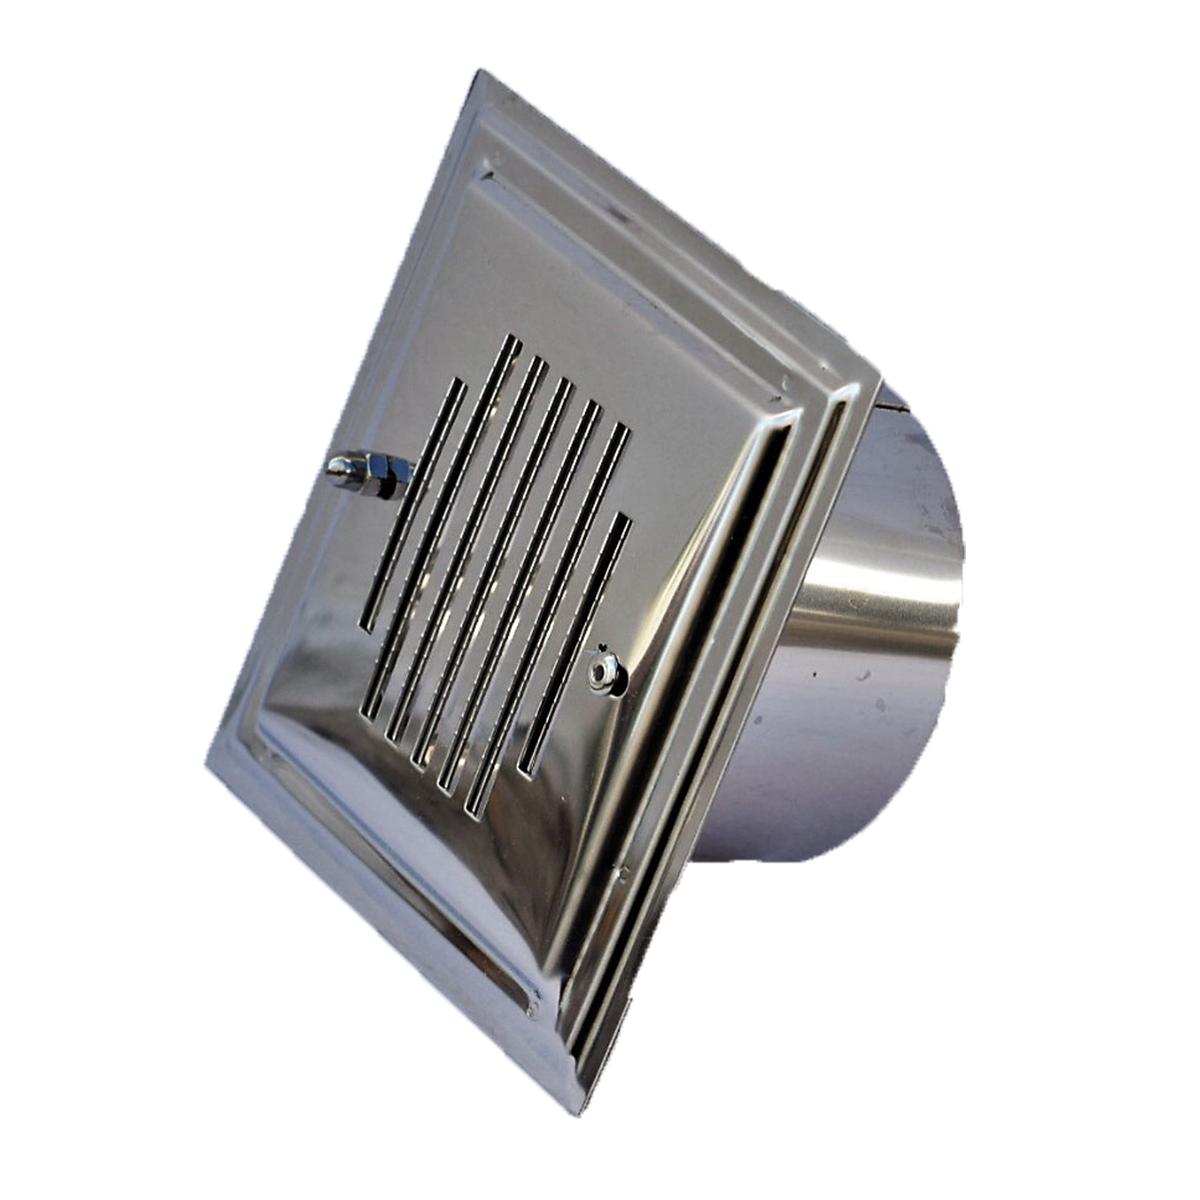 Jr baluja acero inox barbacoa extractora chimenea acero - Rejilla de ventilacion regulable ...